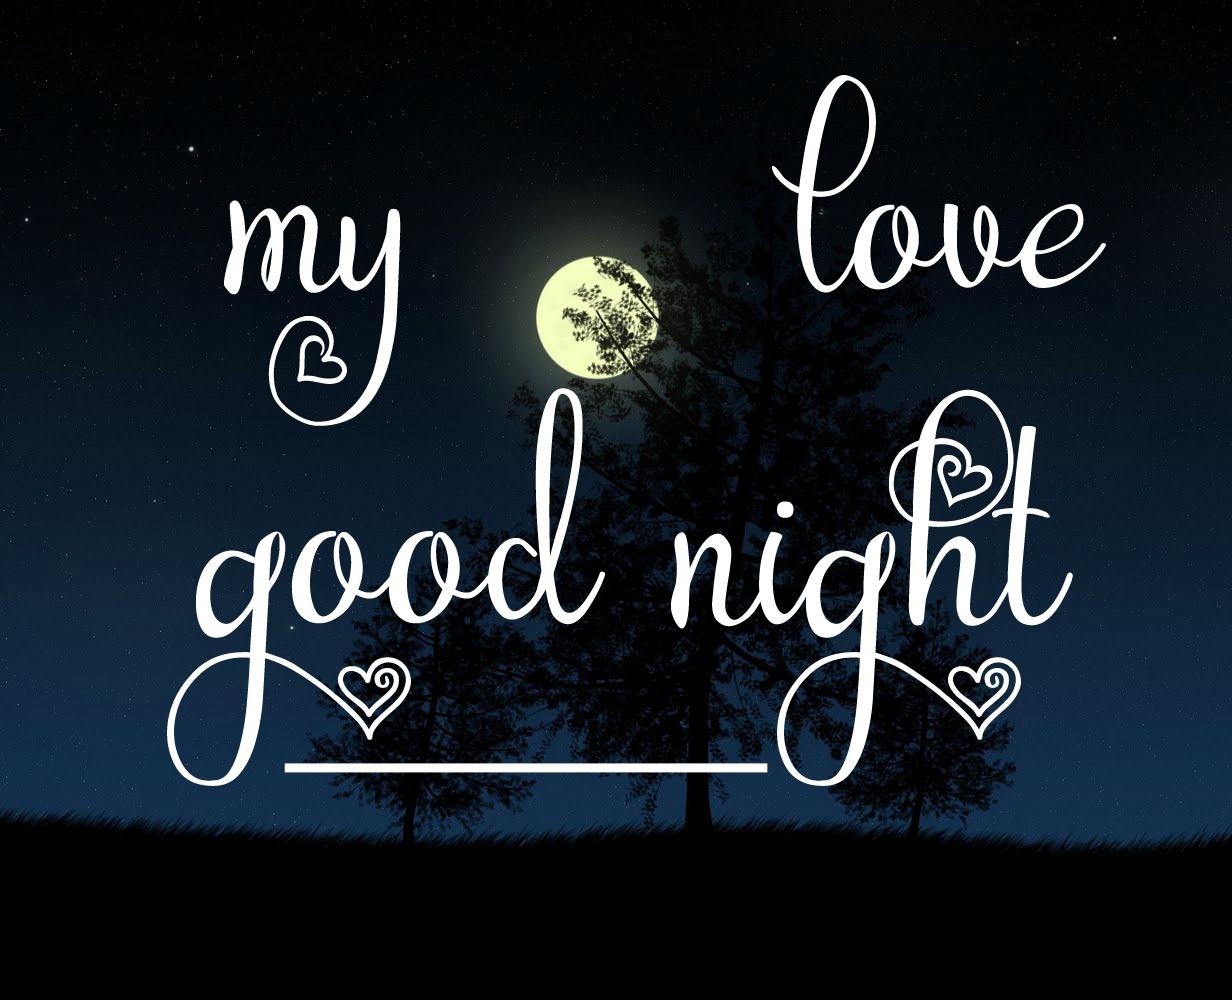 Free good night Images 46